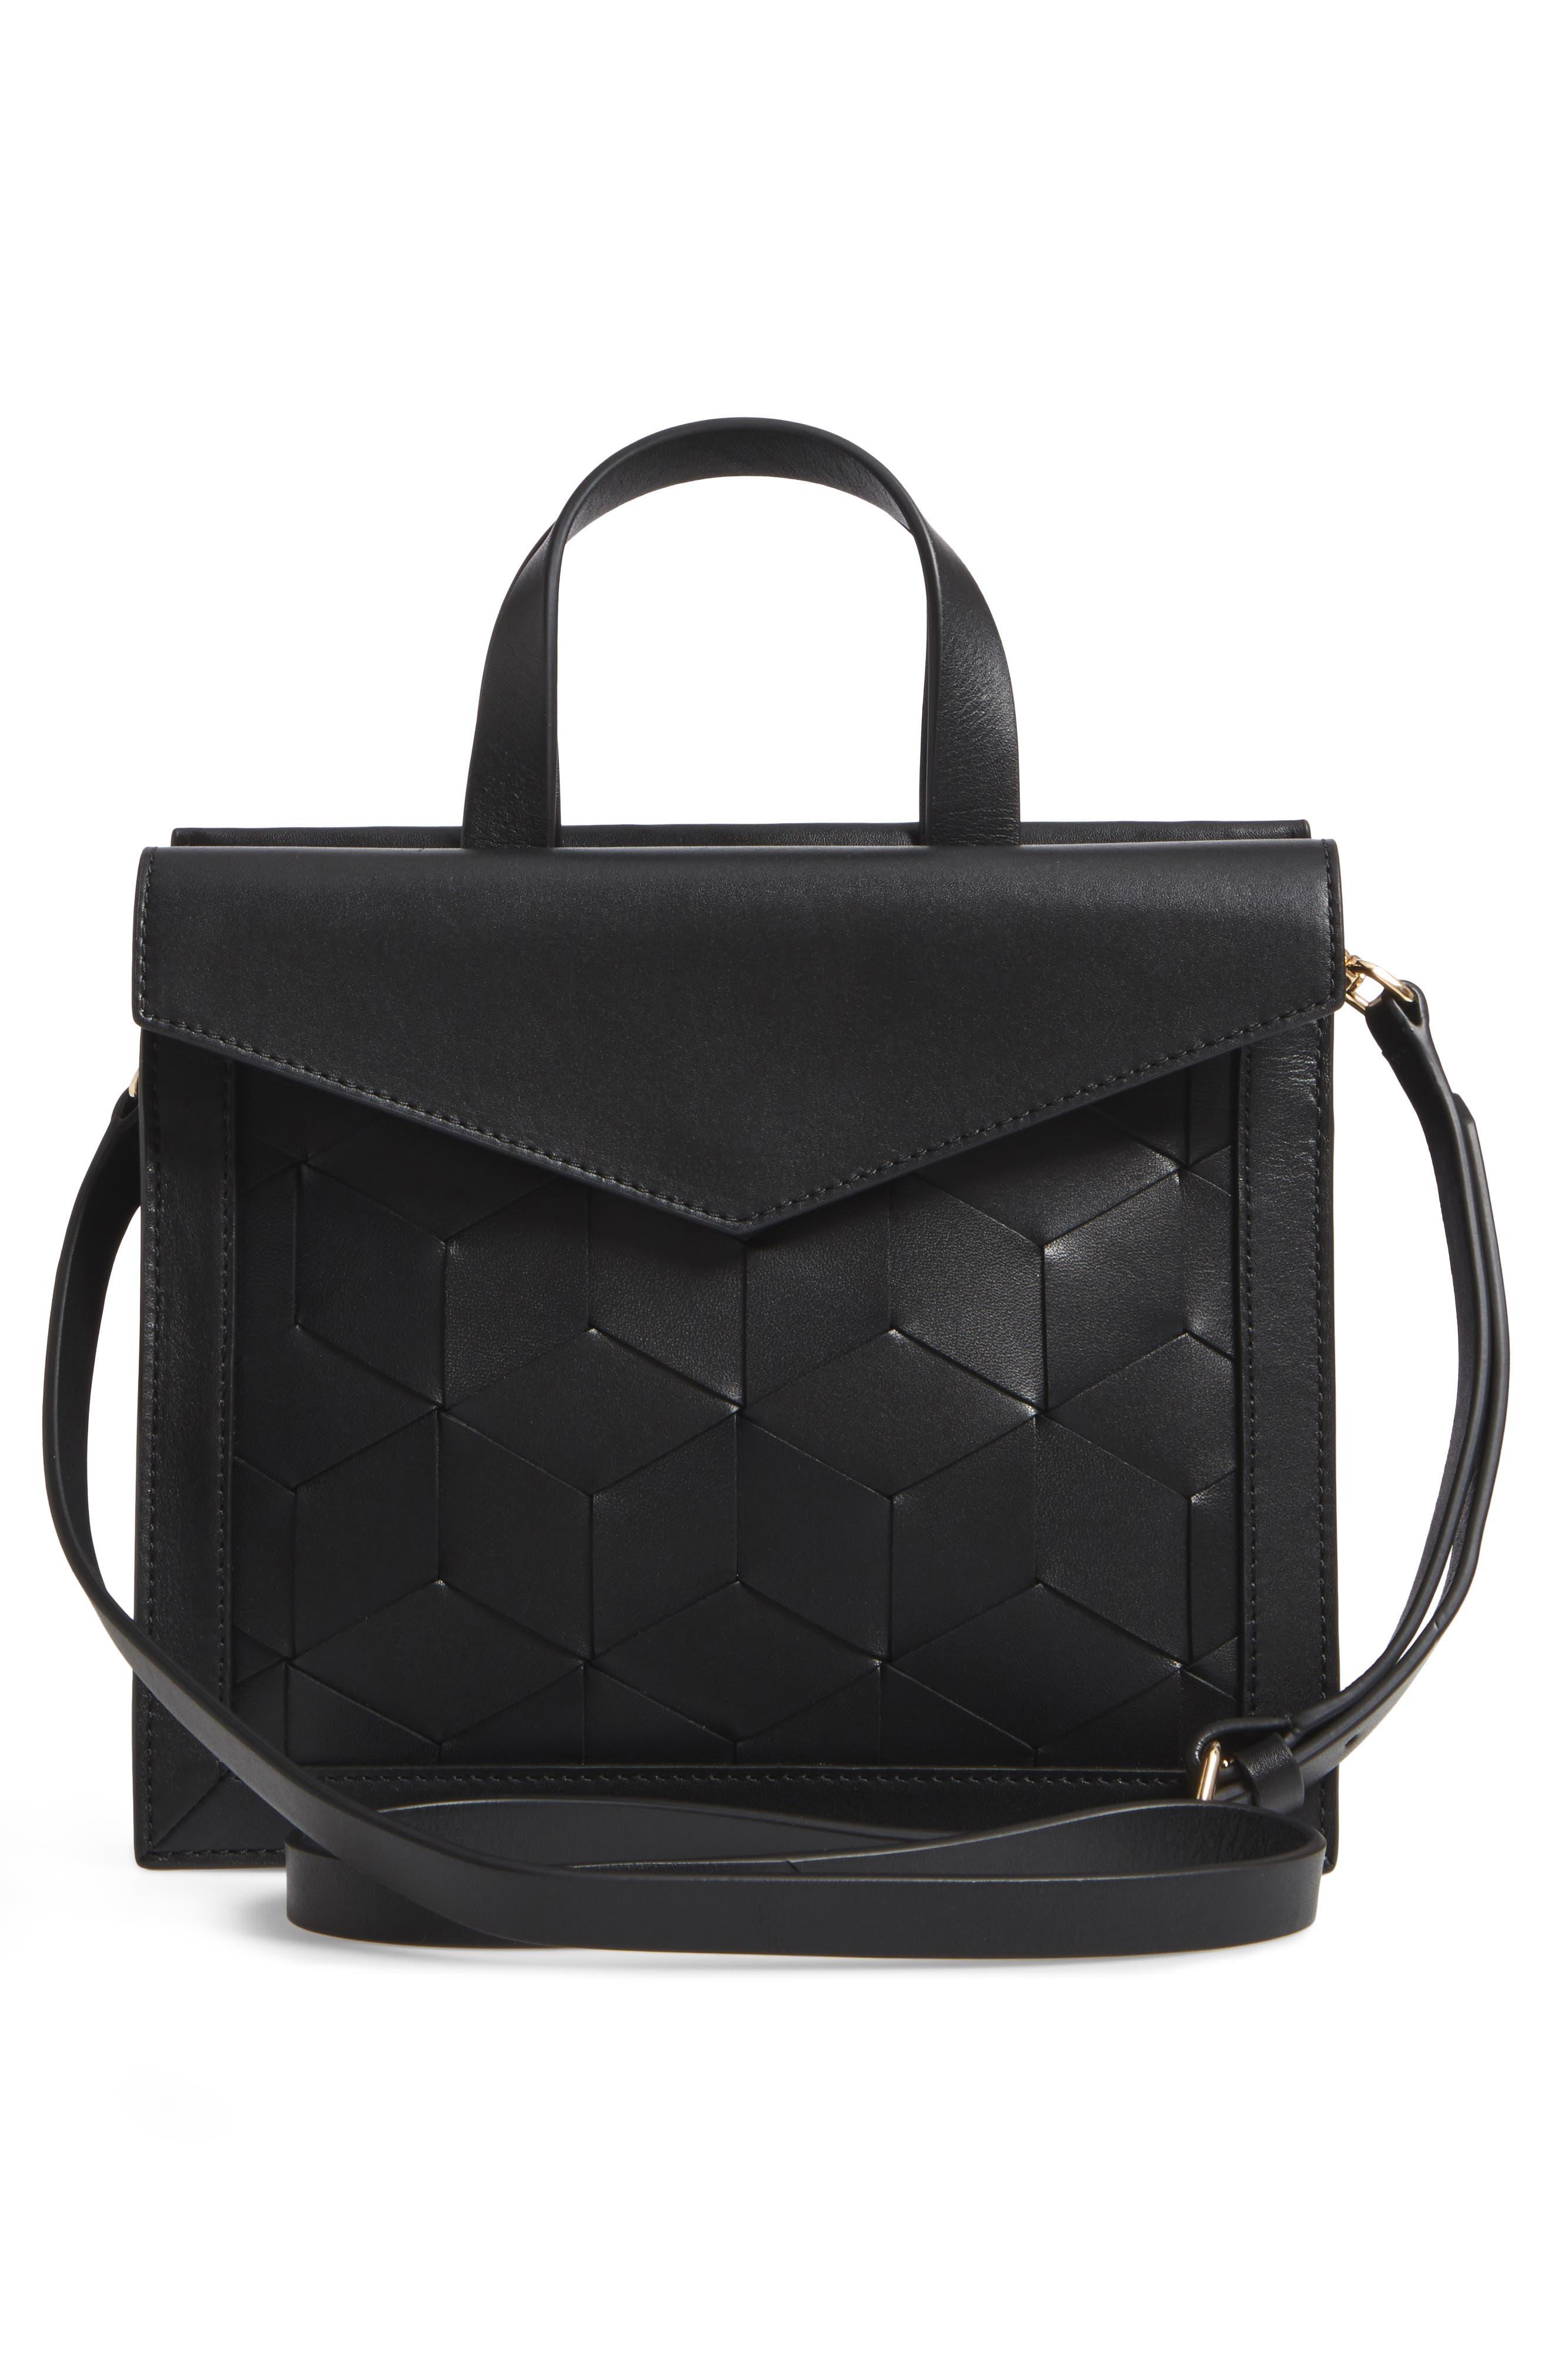 WELDEN Small Voyager Leather Convertible Satchel